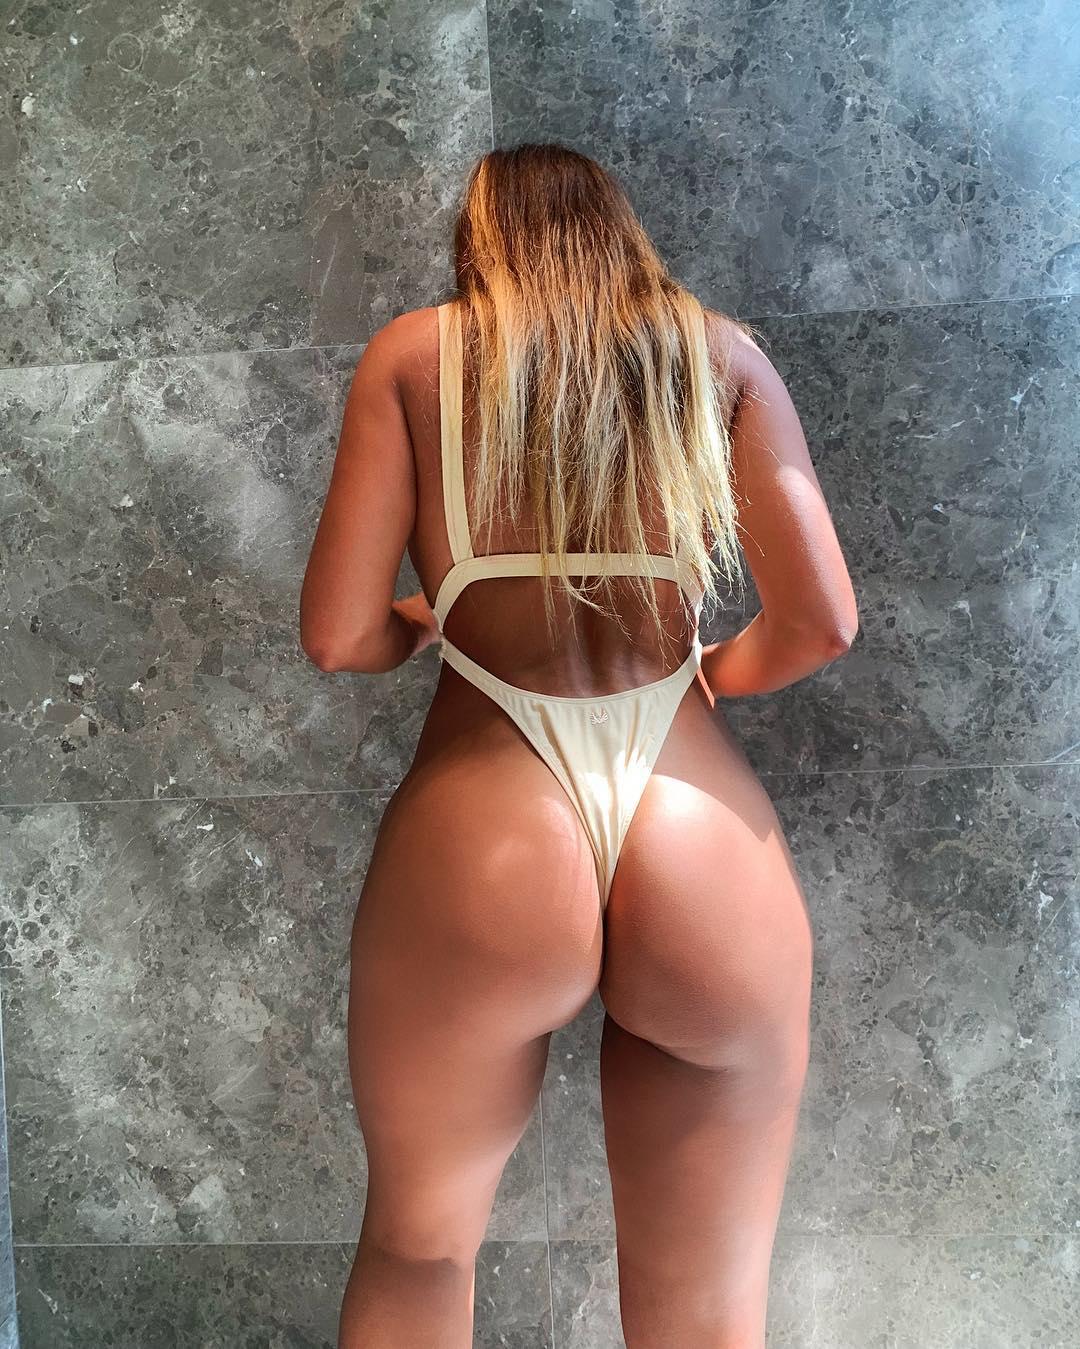 Natalia Garibotto Nude Onlyfans Leaked 0058